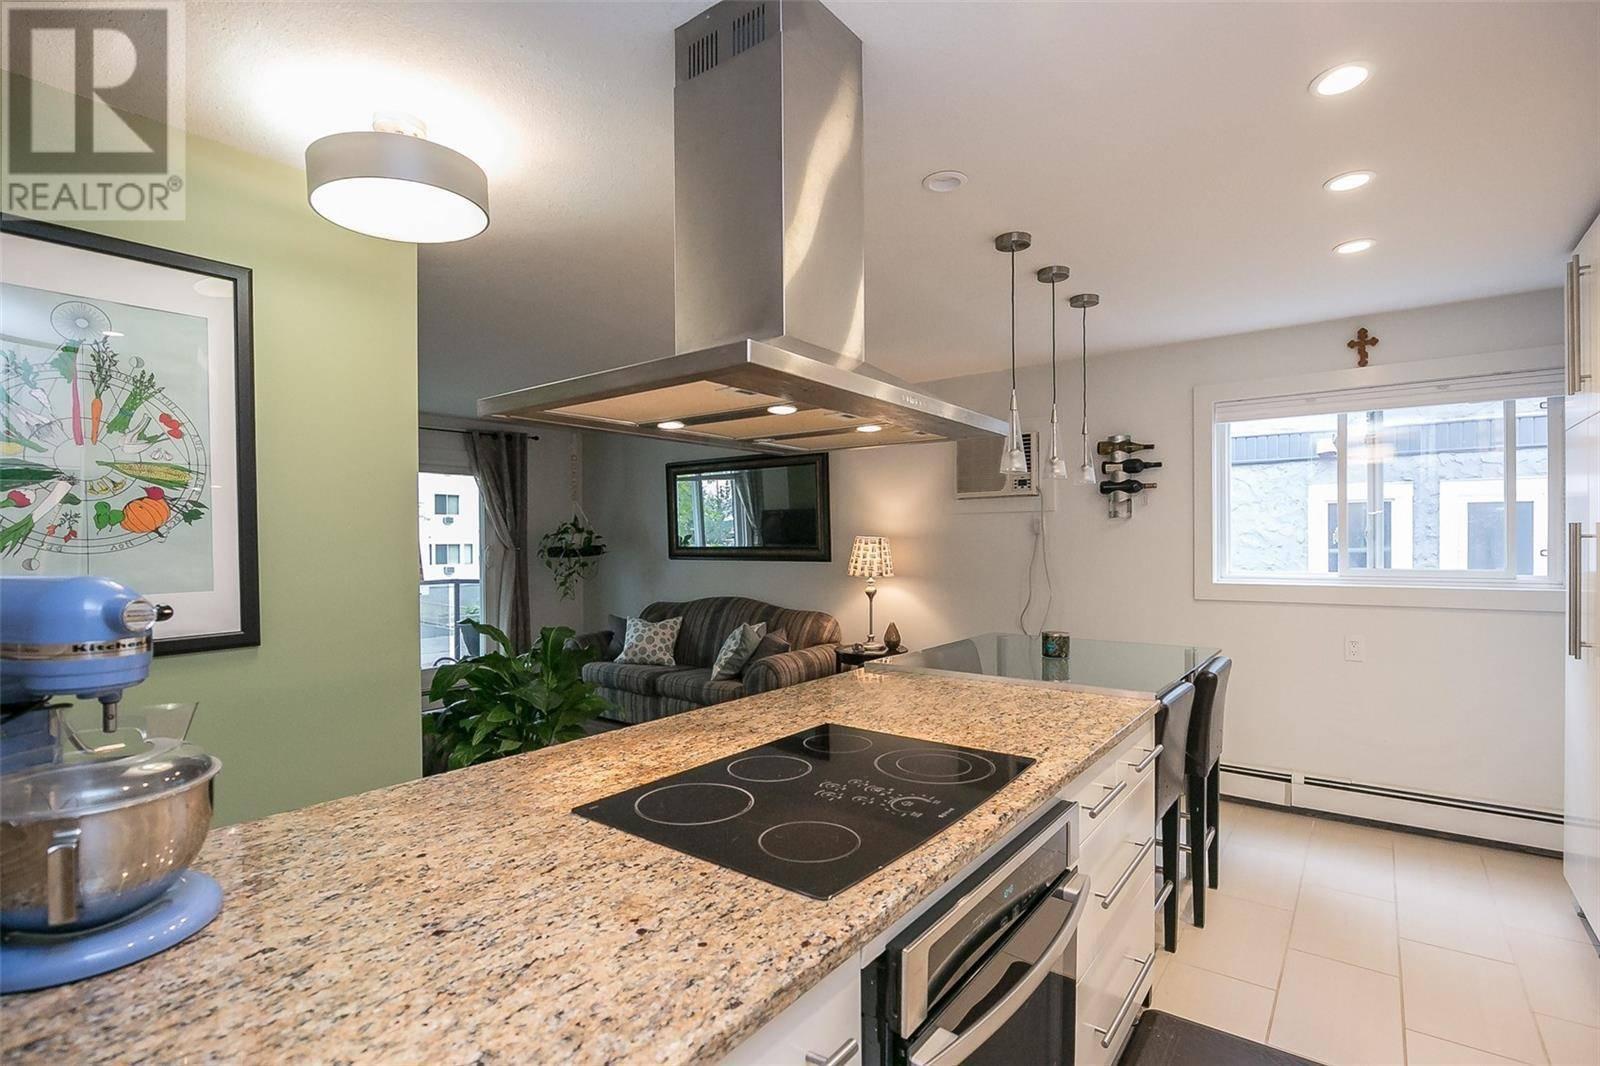 Condo for sale at 441 4th Ave N Unit 6 Saskatoon Saskatchewan - MLS: SK788351